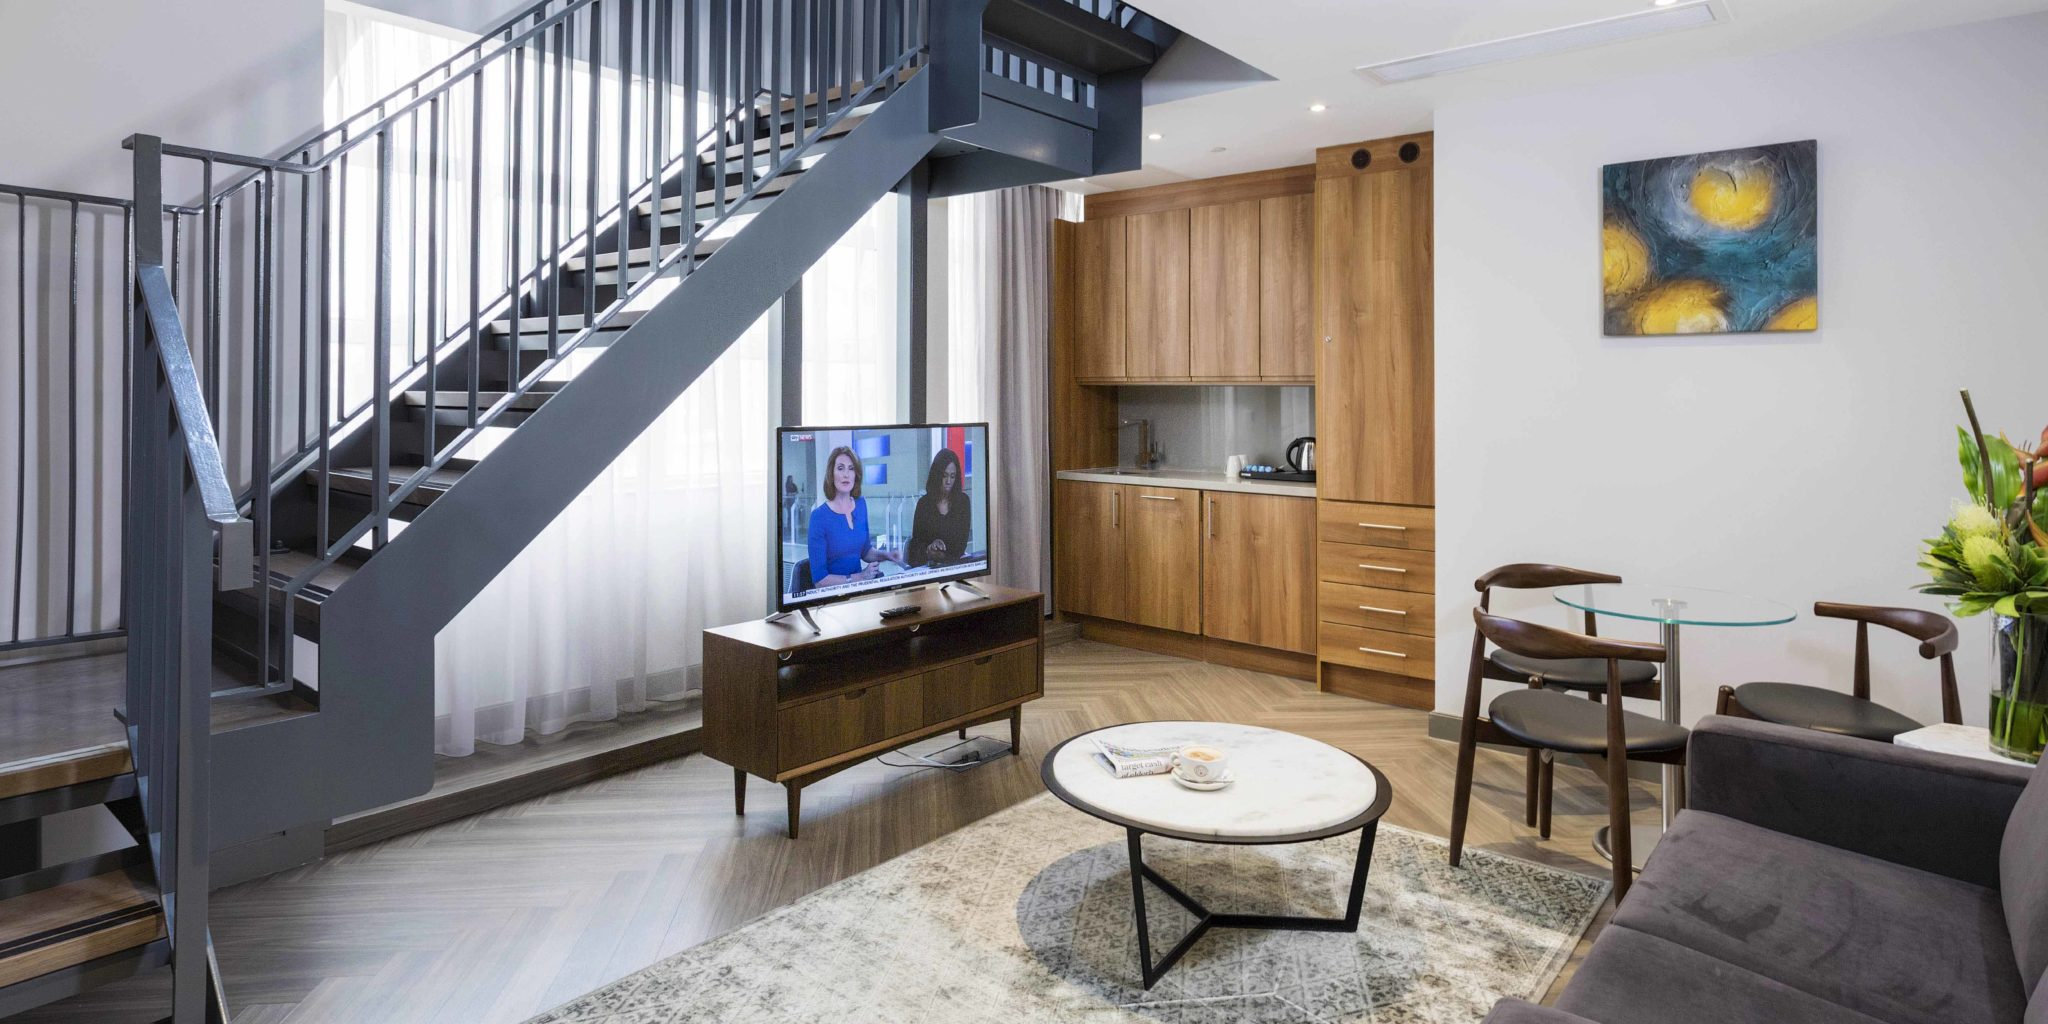 Book Dublin City Centre studio apartment accommodation